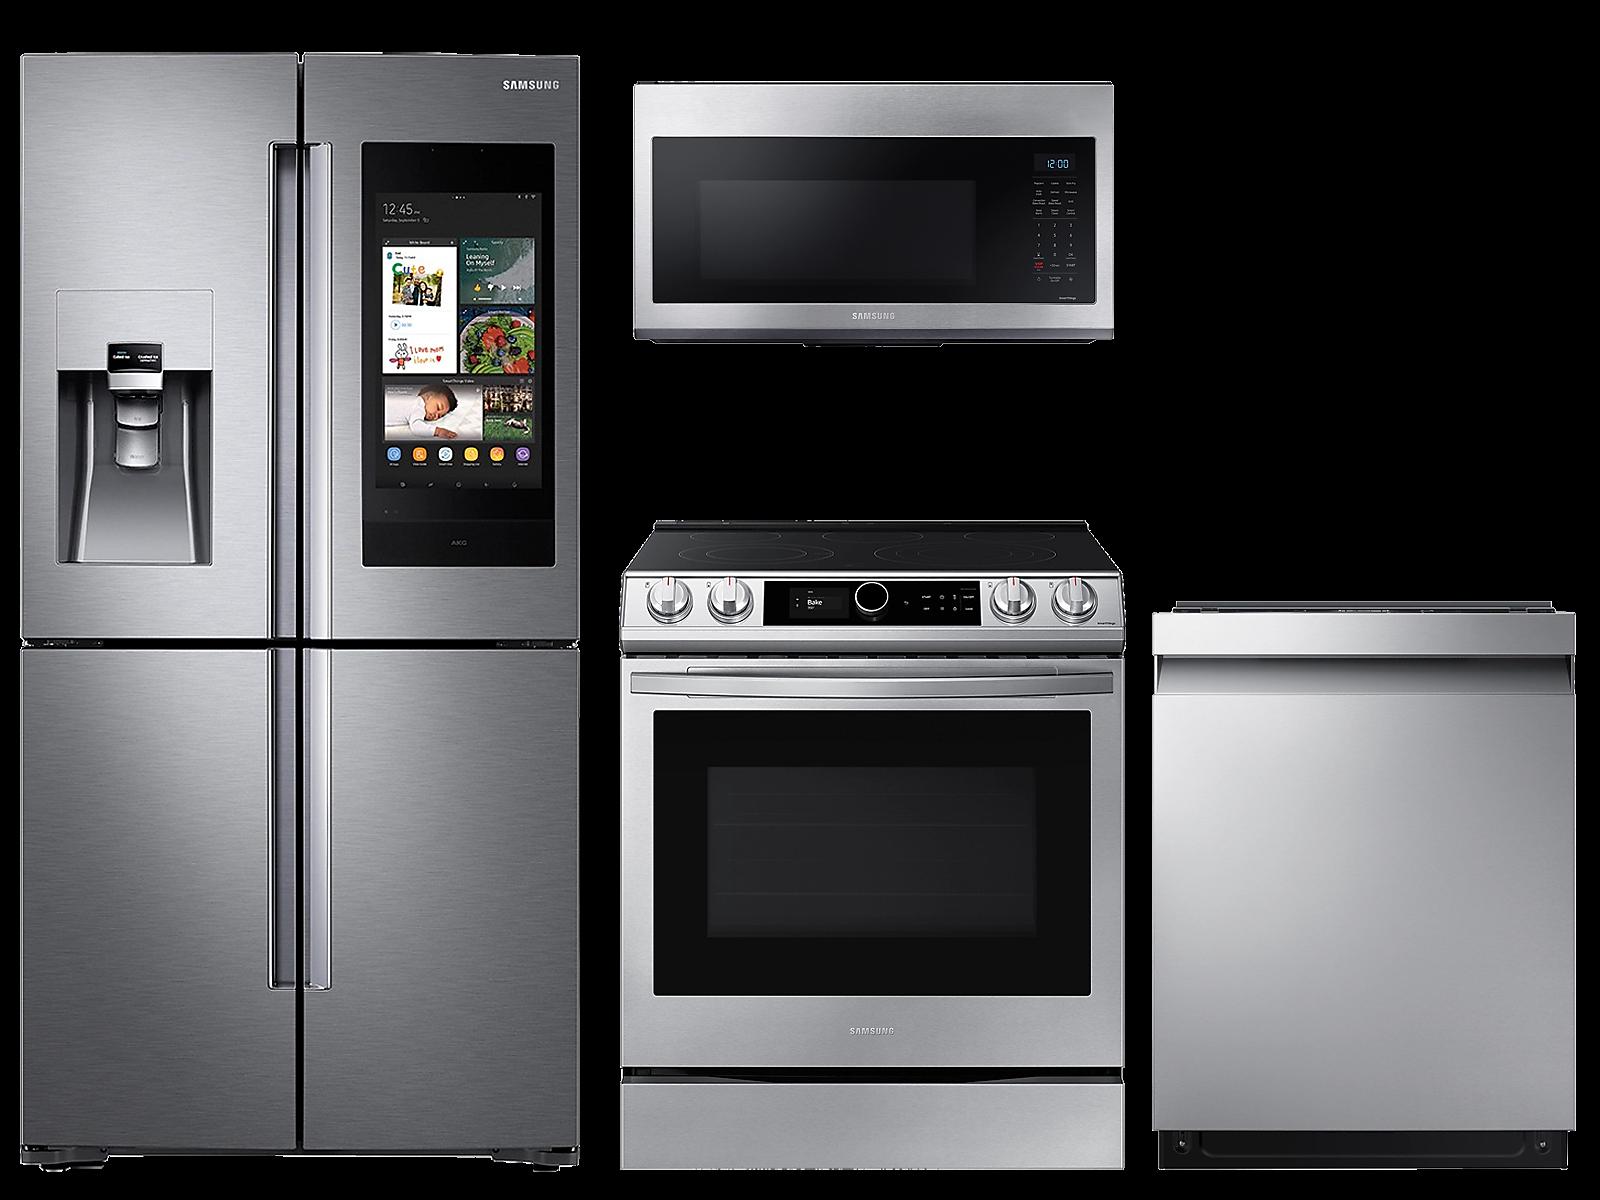 Samsung coupon: Samsung 28 cu. ft. Family HubTM 4-door refrigerator, 6.3 cu. ft. electric range, microwave and 42 dBA dishwasher package(BNDL-1614704416676)